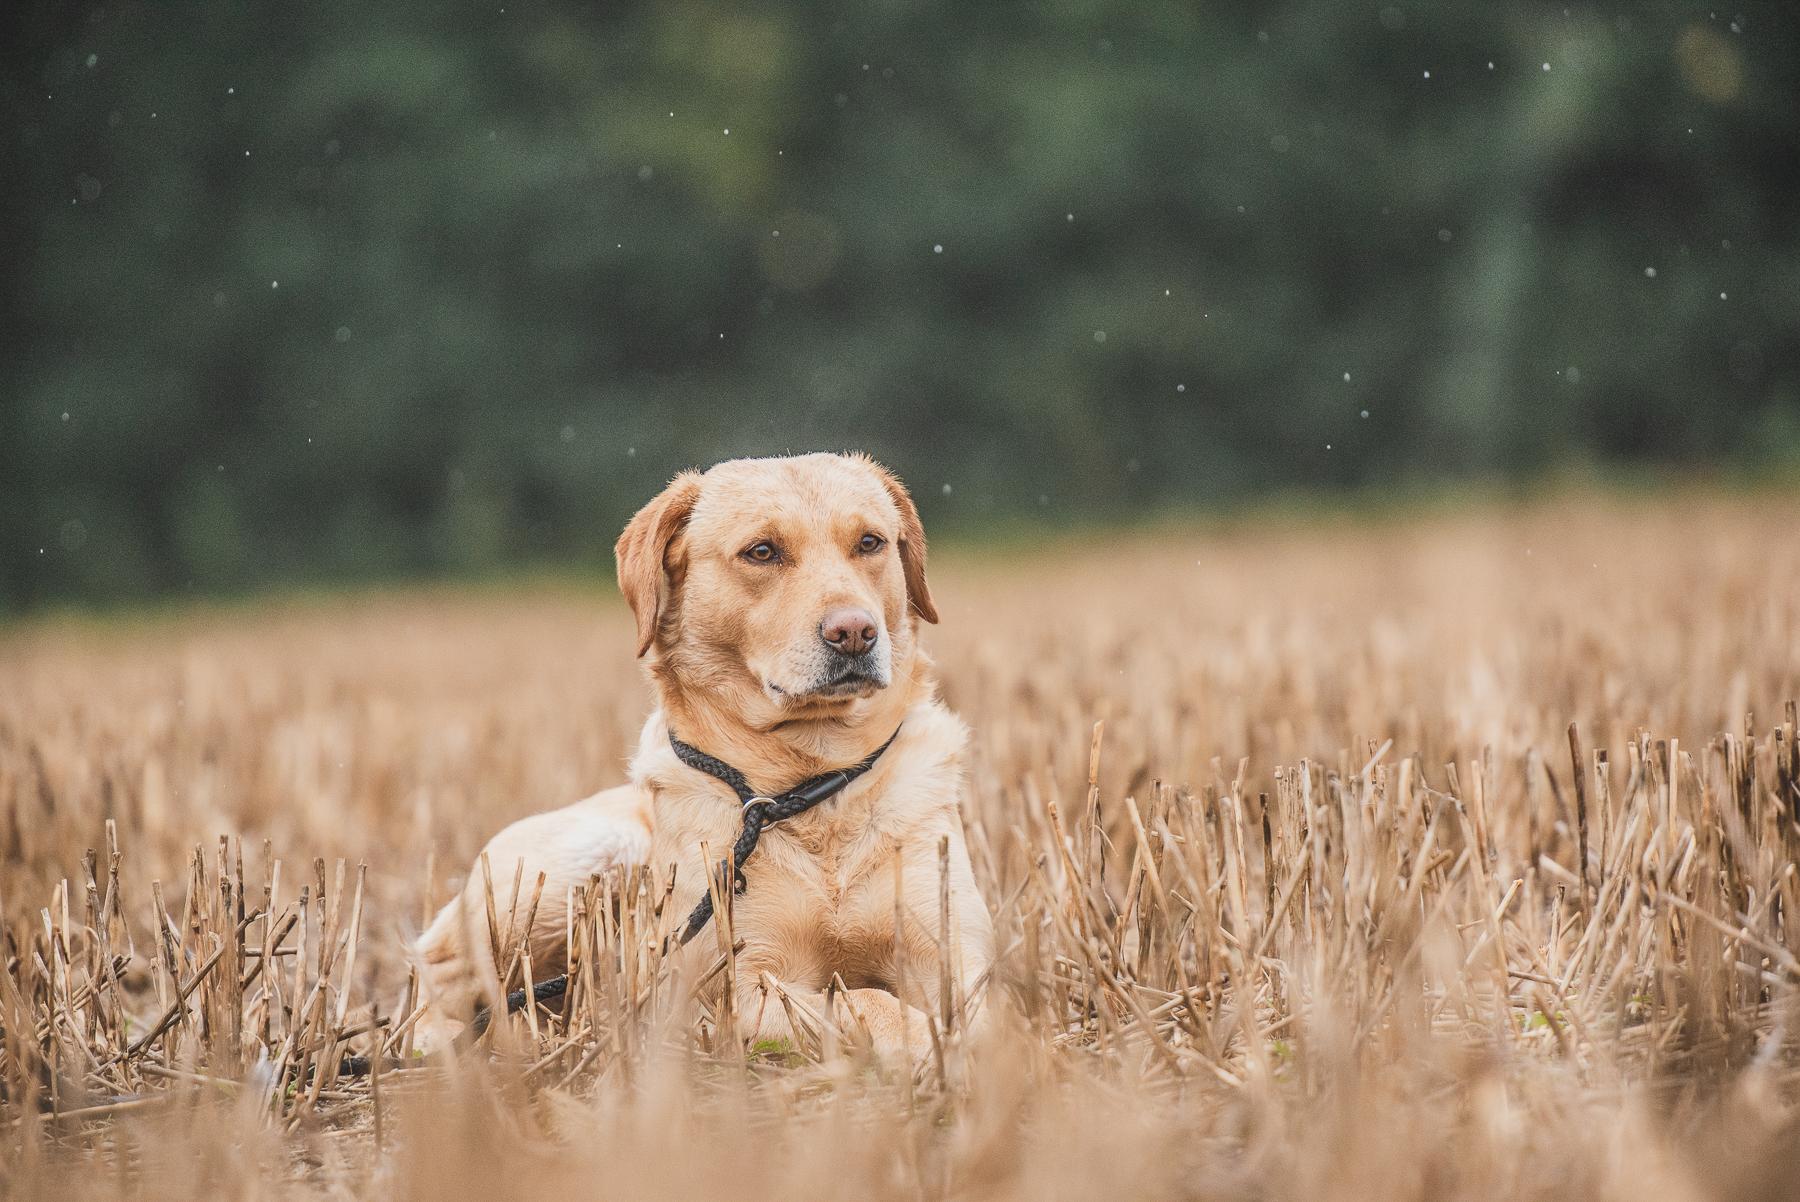 Gun dog lying down in wheat field